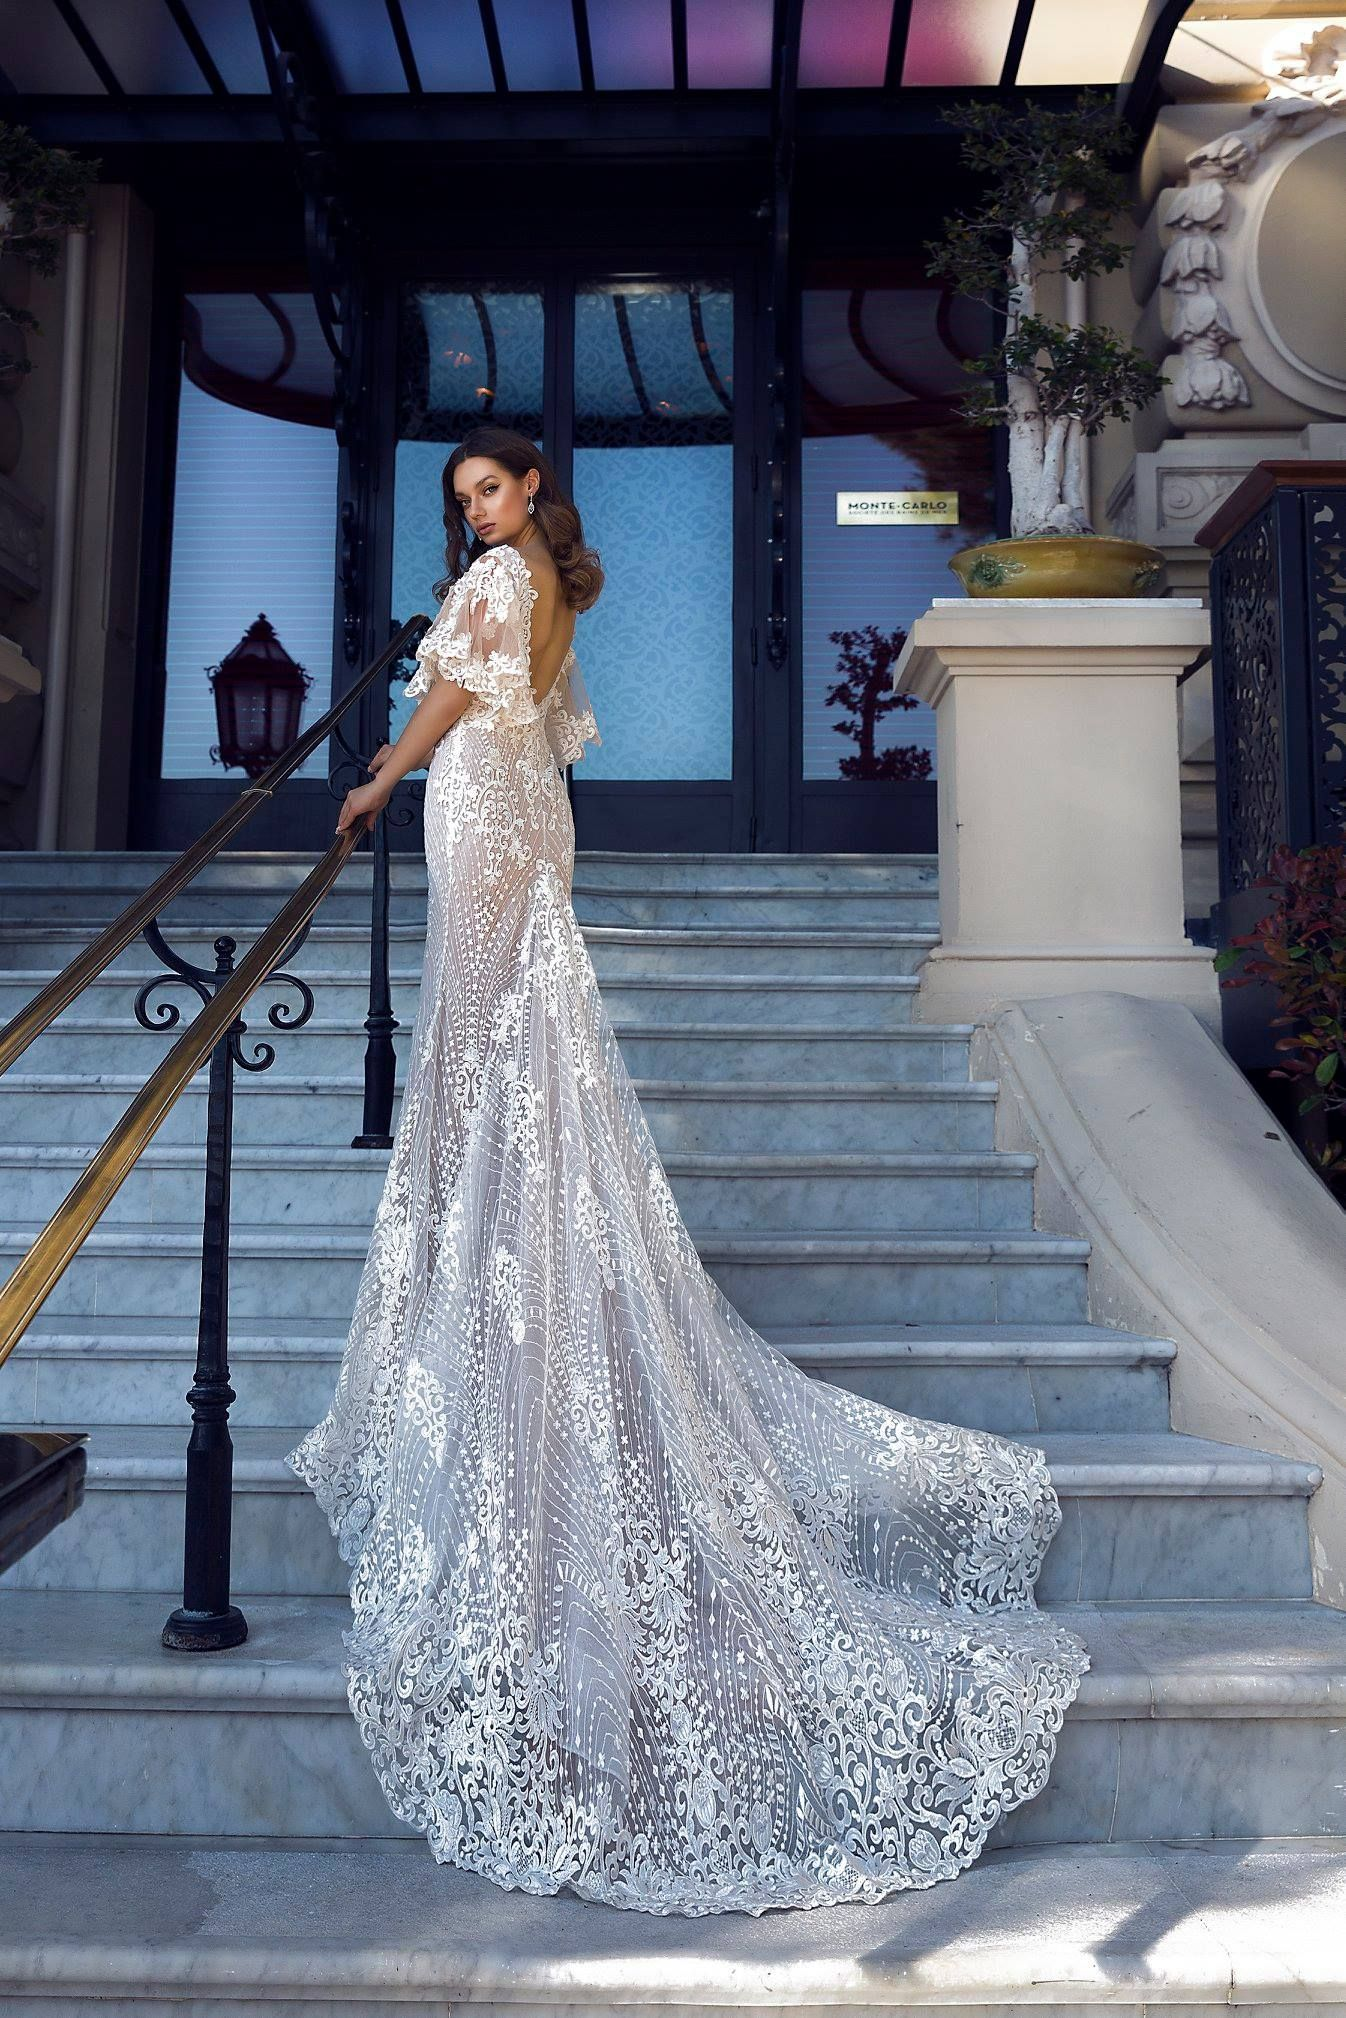 PARIS wedding dress by TINA VALERDI ONLY at Charmé Gaby Bridal Gown ...